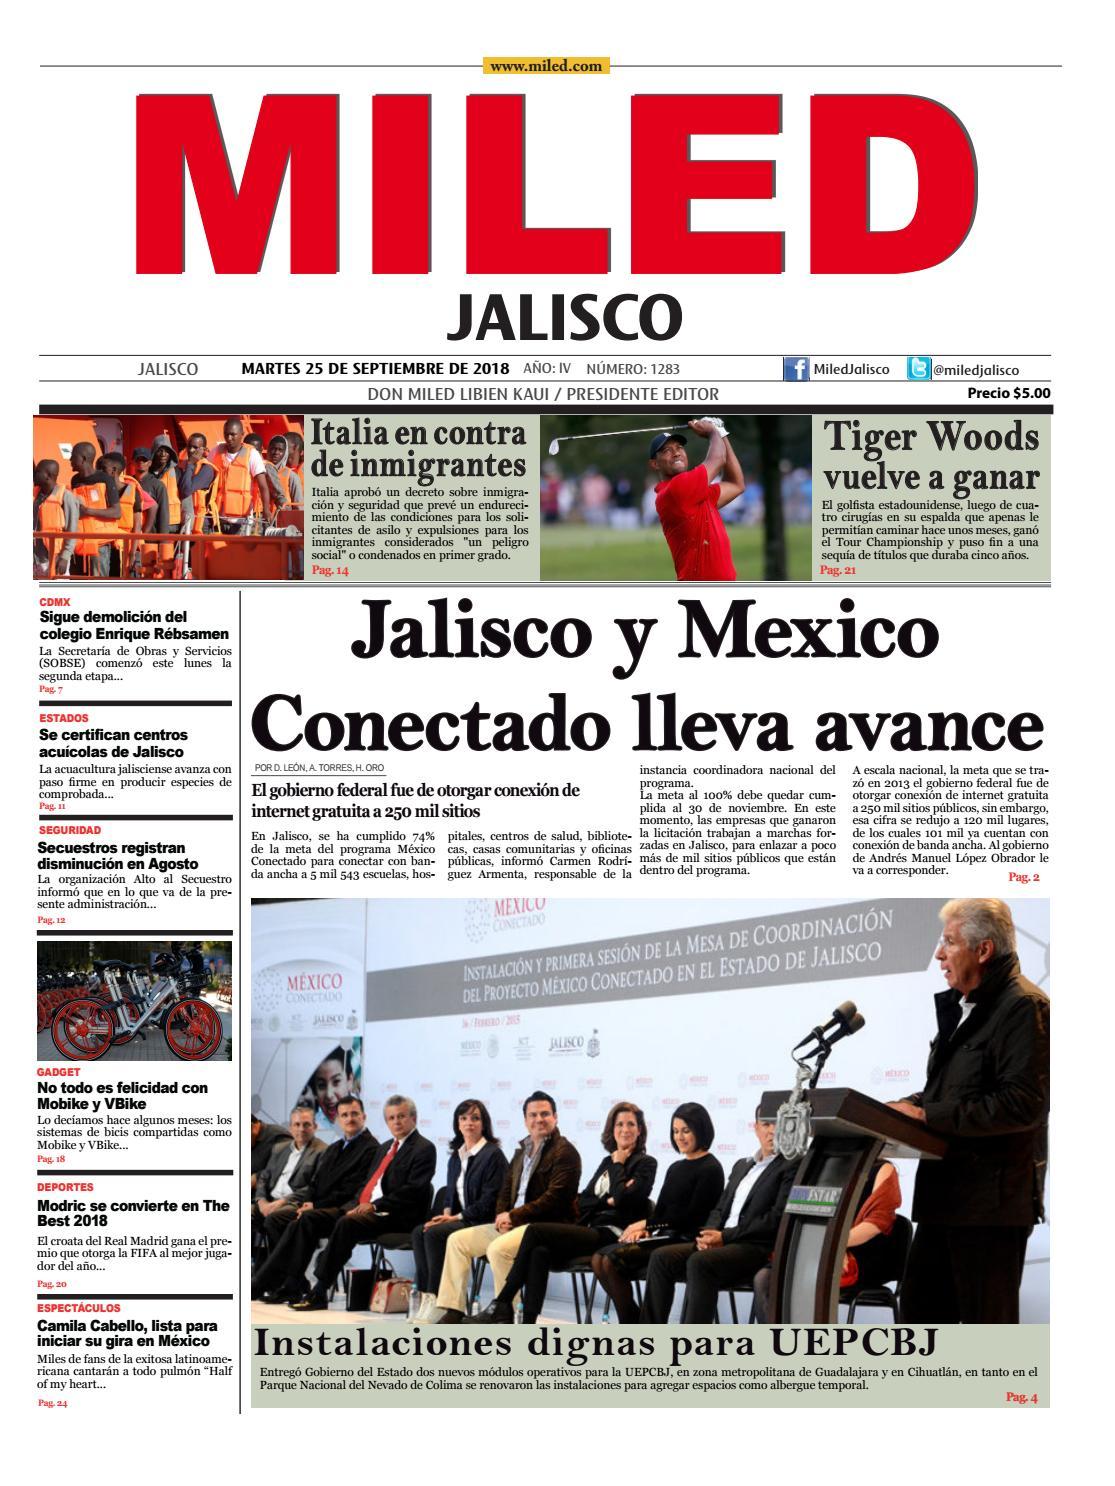 Miled Jalisco 25 09 18 By Miled Estados Issuu